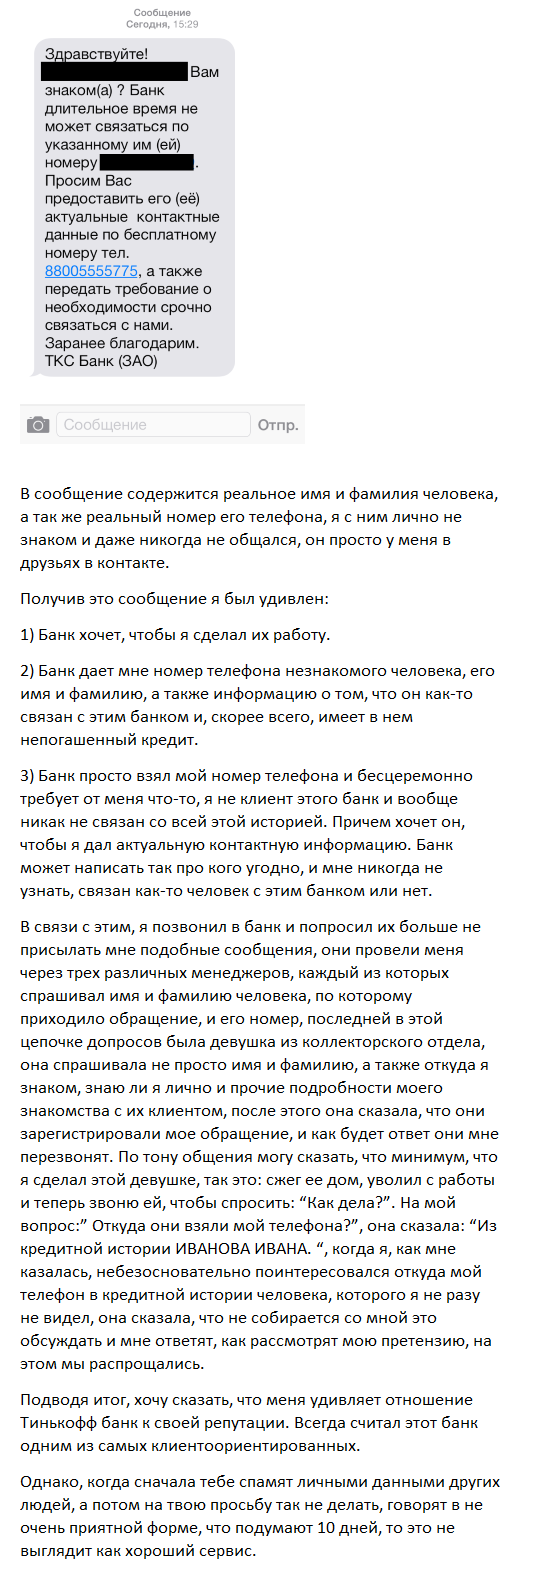 http://img-fotki.yandex.ru/get/9760/130422193.1f9/0_d87b1_4db3a885_orig